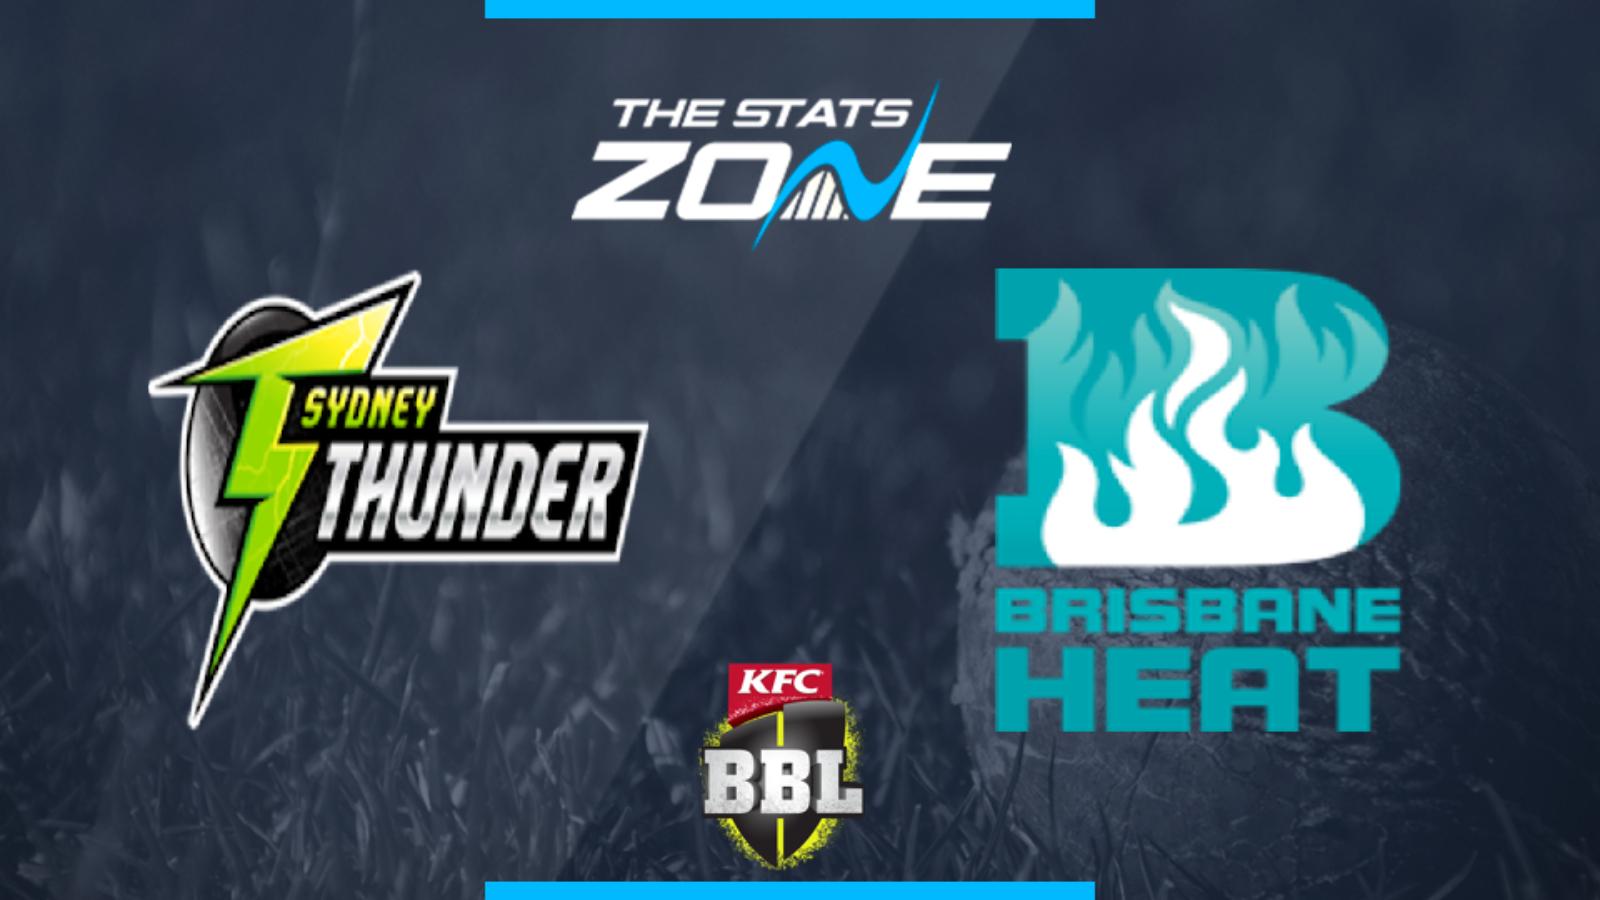 sydney thunder vs brisbane heat betting preview